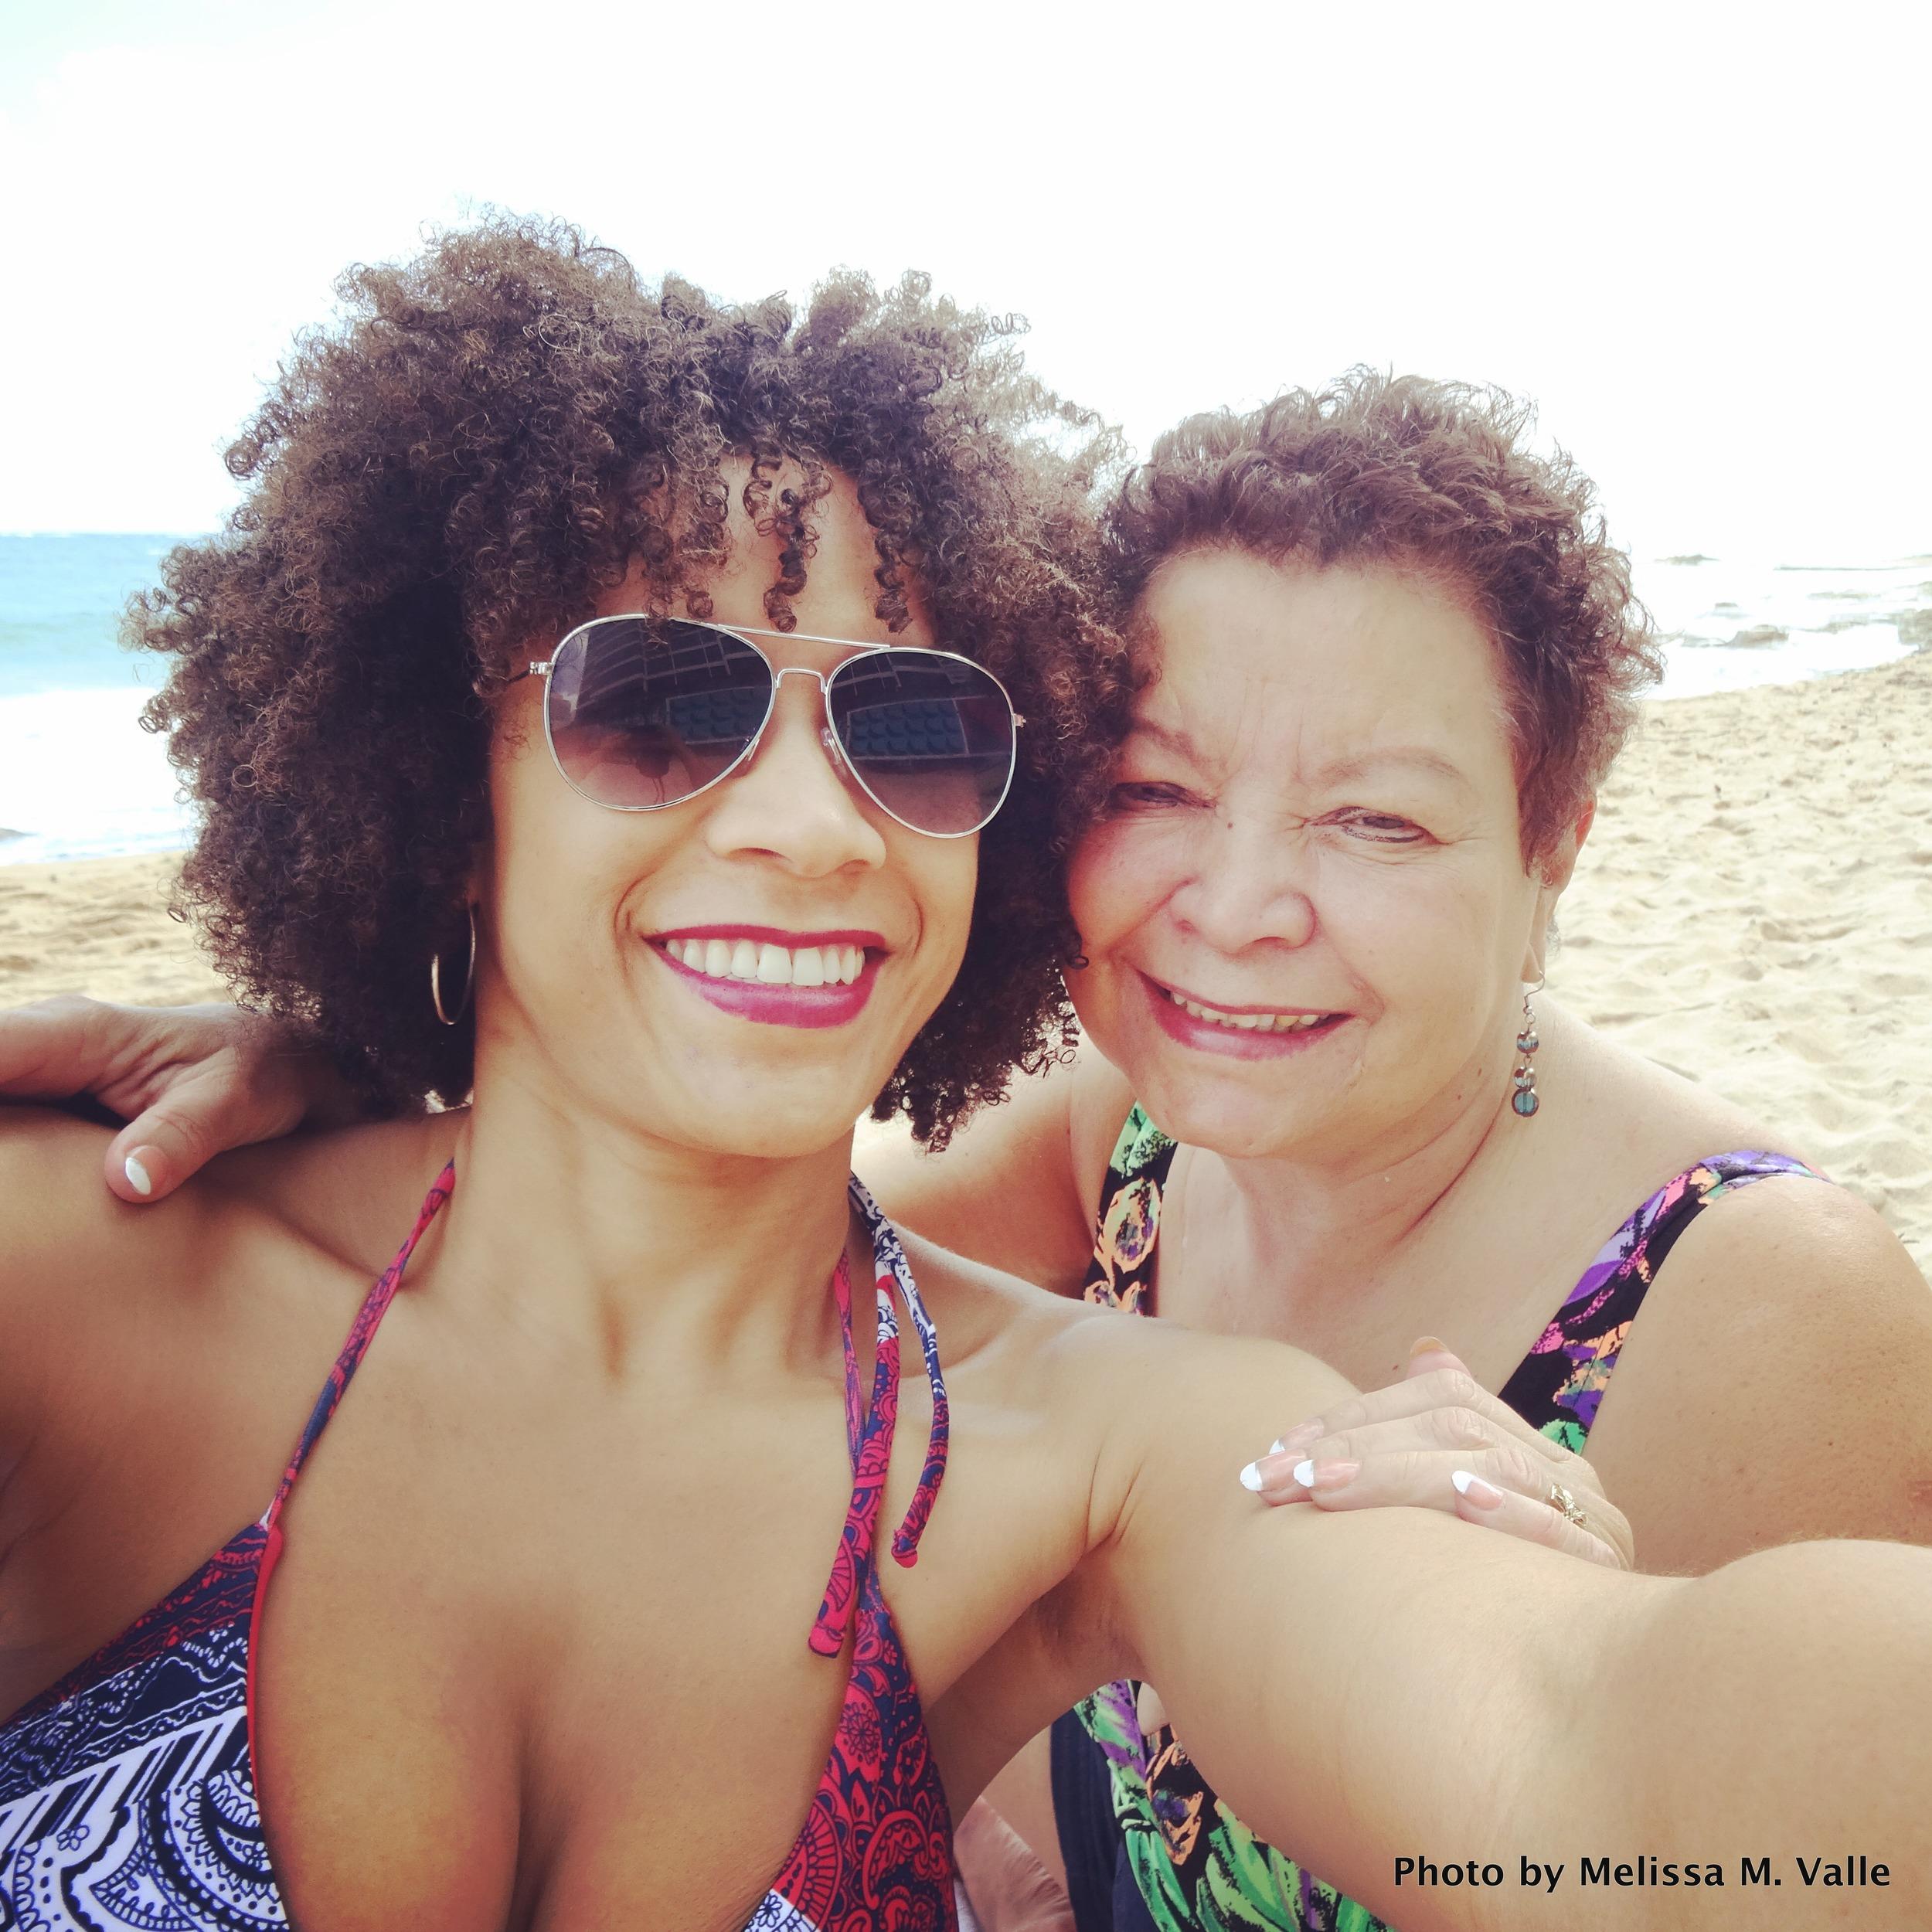 3.13.15 San Juan, PR-Me and Mami on beach in Condado IG (1).JPG